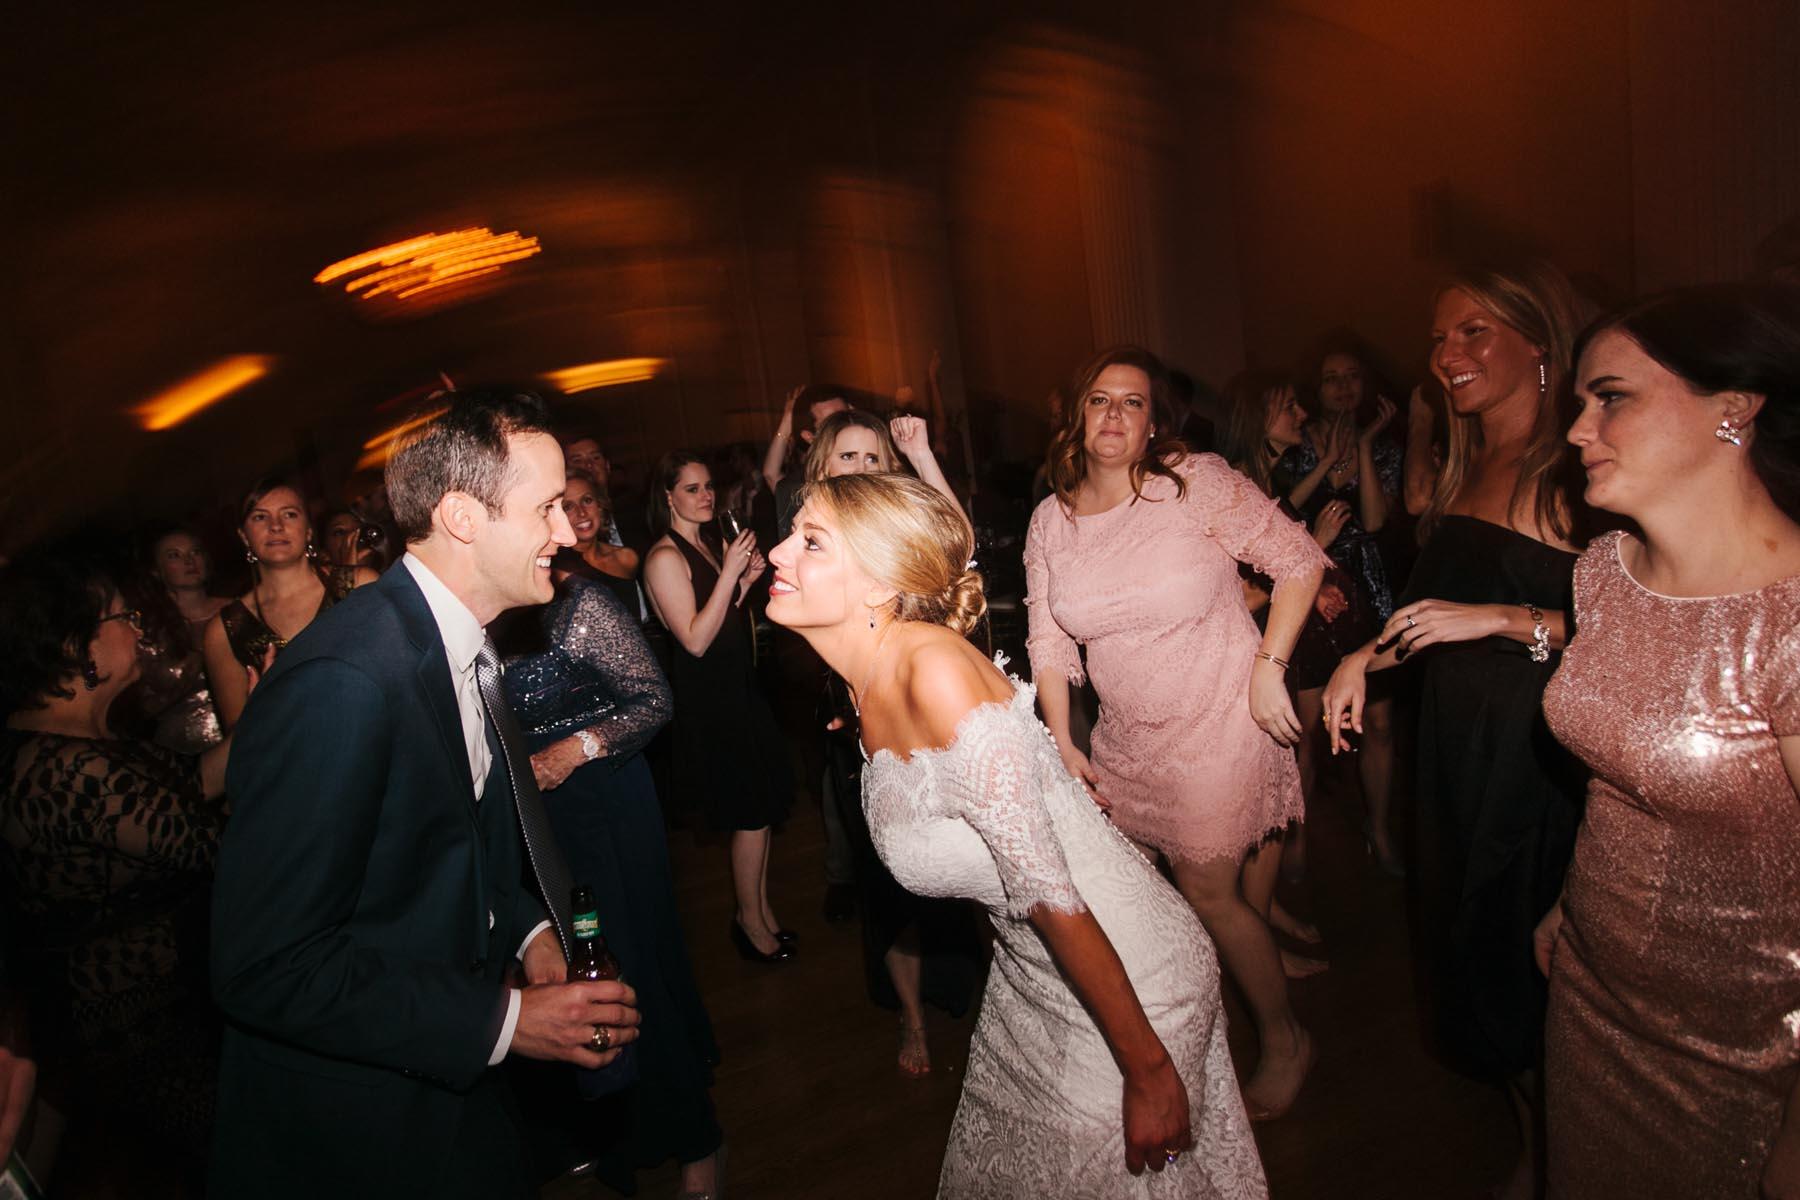 kjellman wedding blog biltmore wedding -118